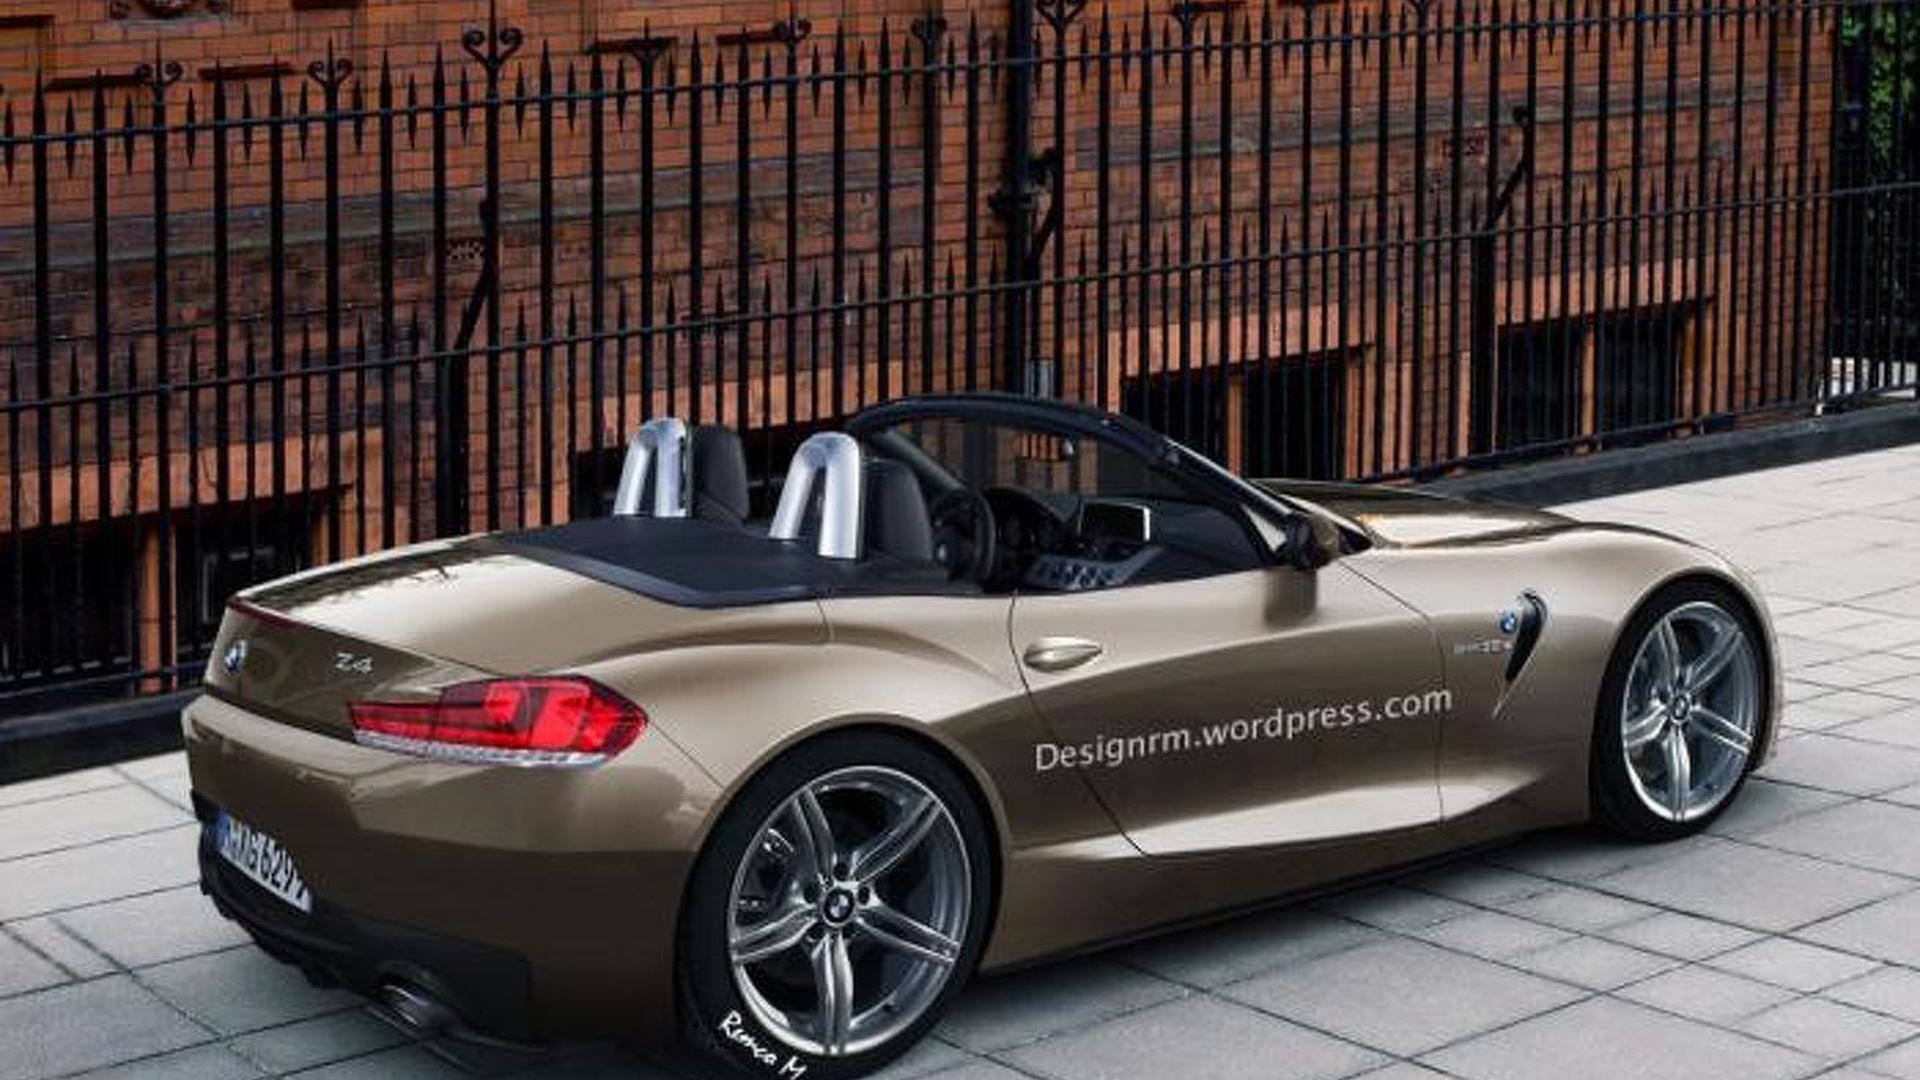 Toyota 2017 Supra >> 2017/2018 BMW Z4 roadster imagined